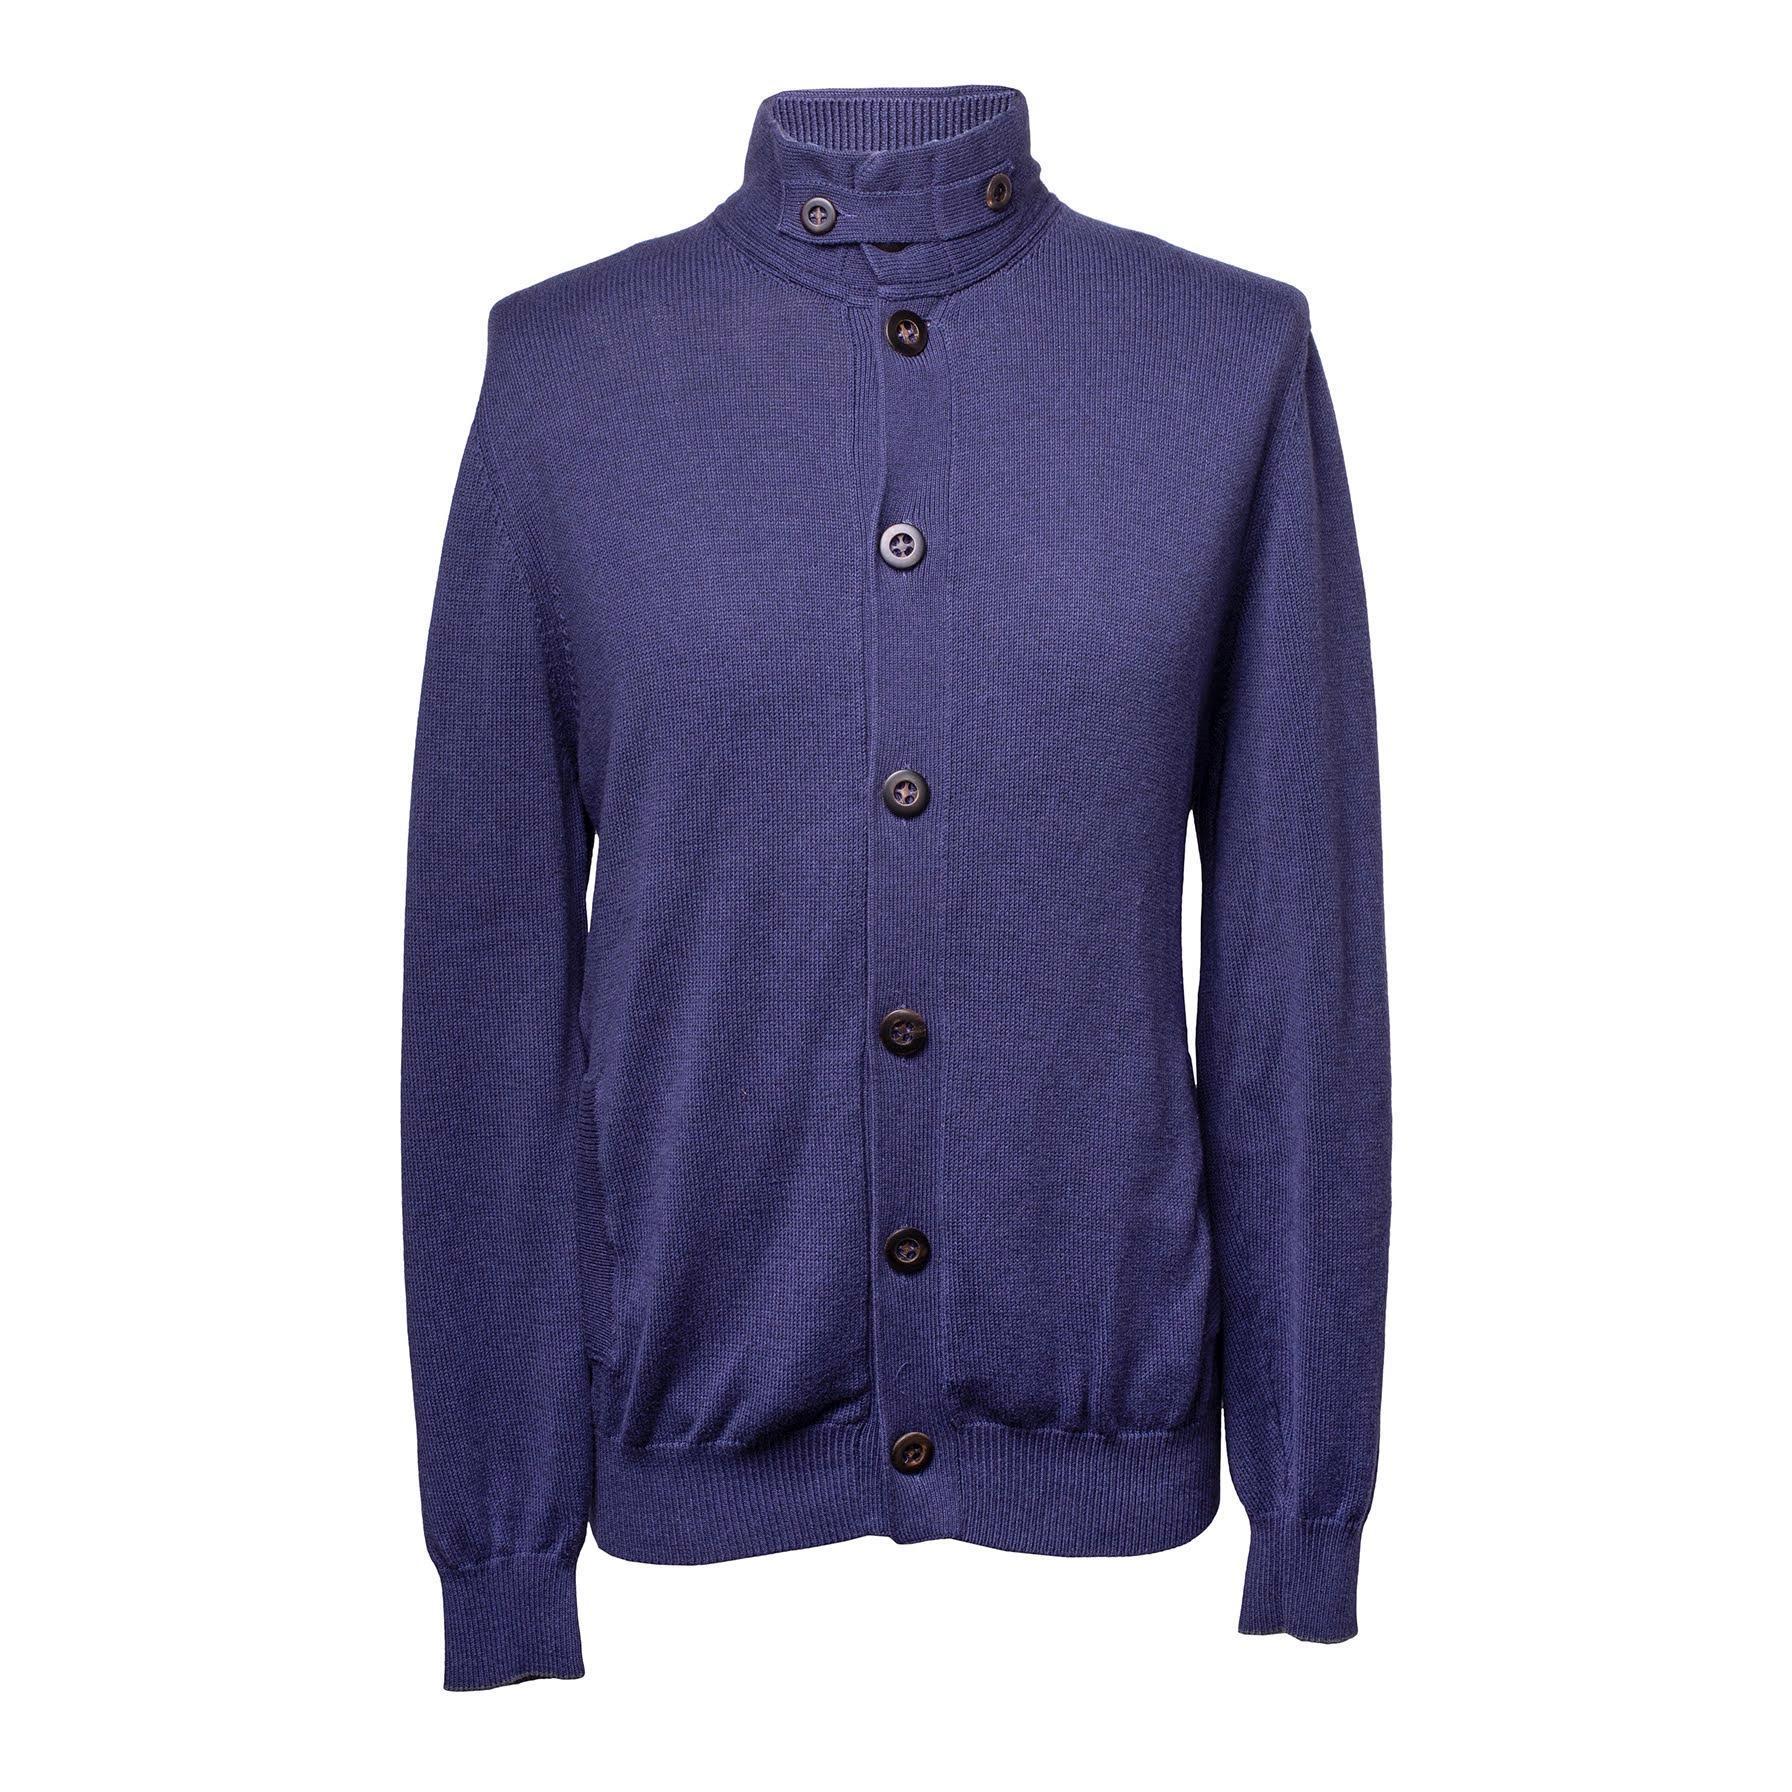 Brunello Cucinelli Size Xl Cotton Cardigan